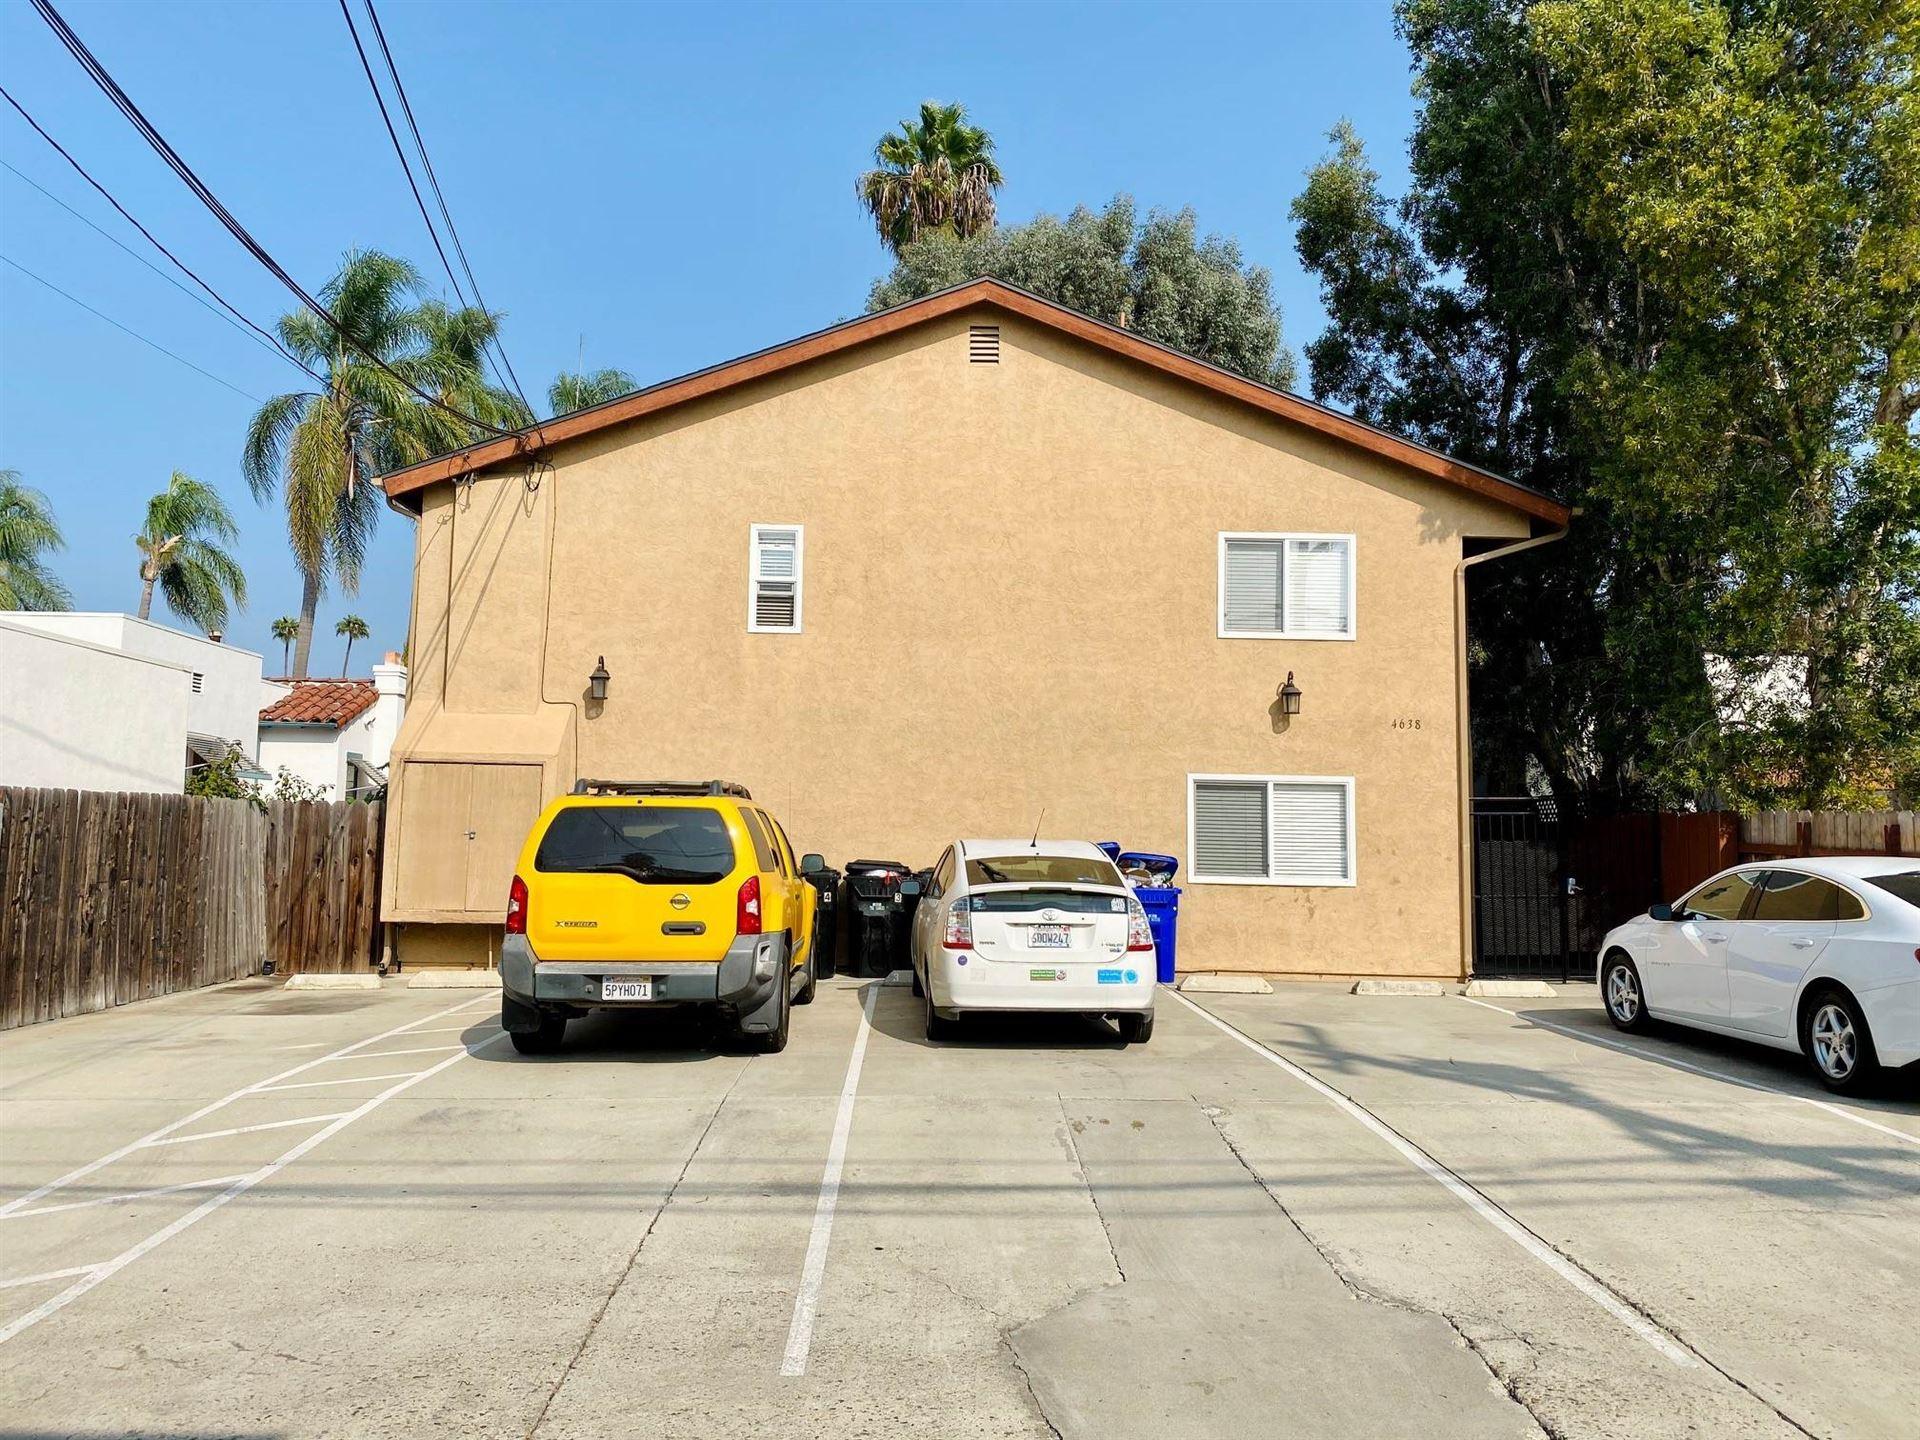 Photo of 4638 Kensington Drive, San Diego, CA 92116 (MLS # 200046007)